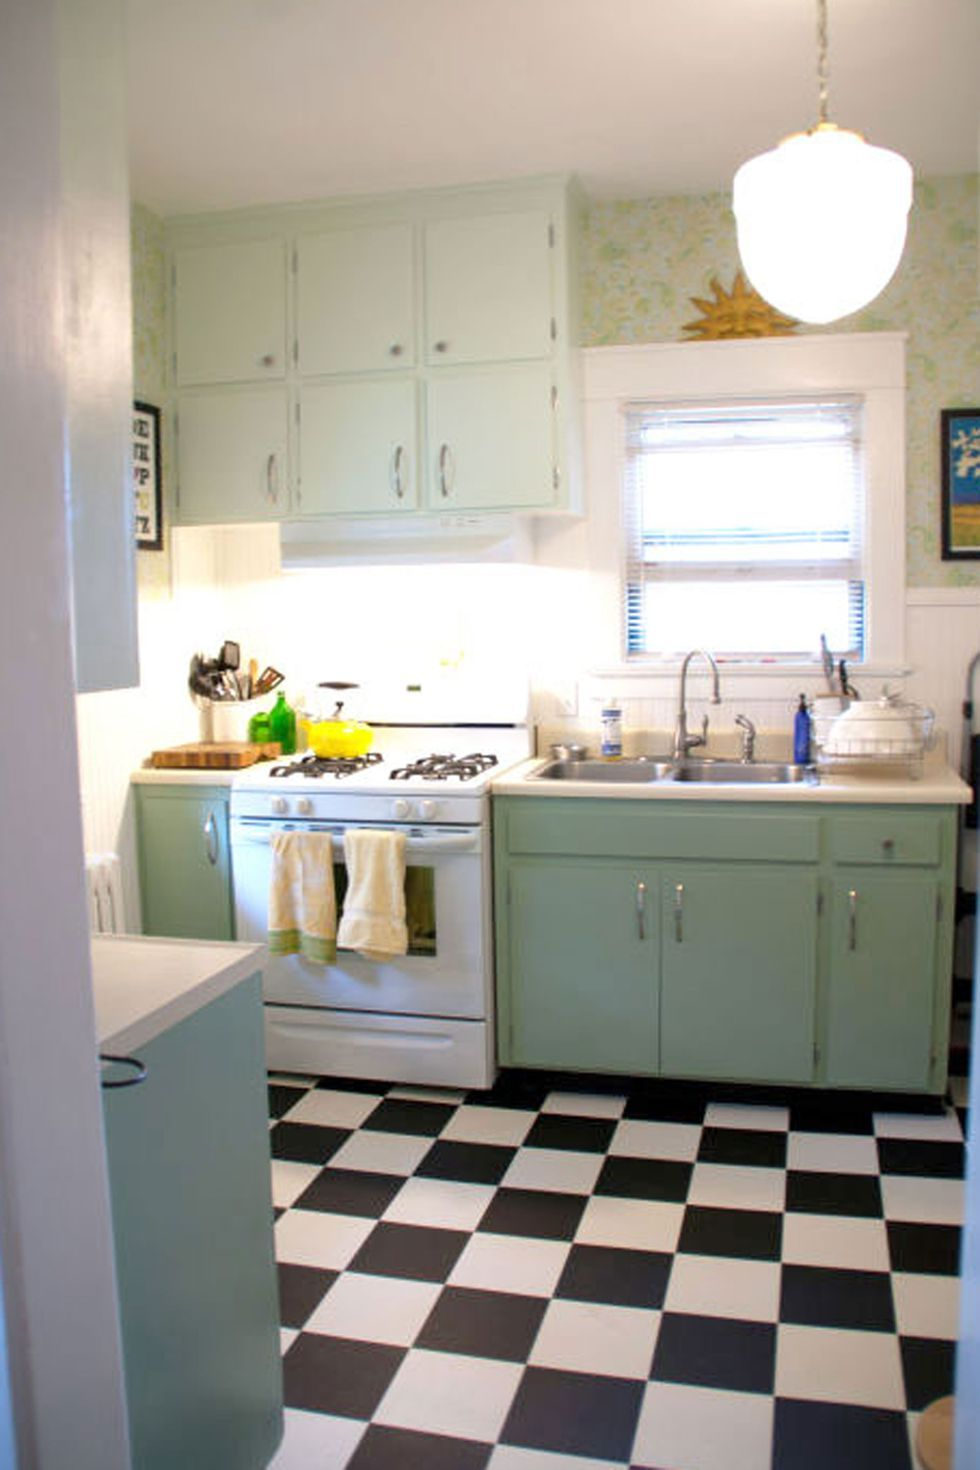 11 retro diner decor ideas for your kitchen  diner decor